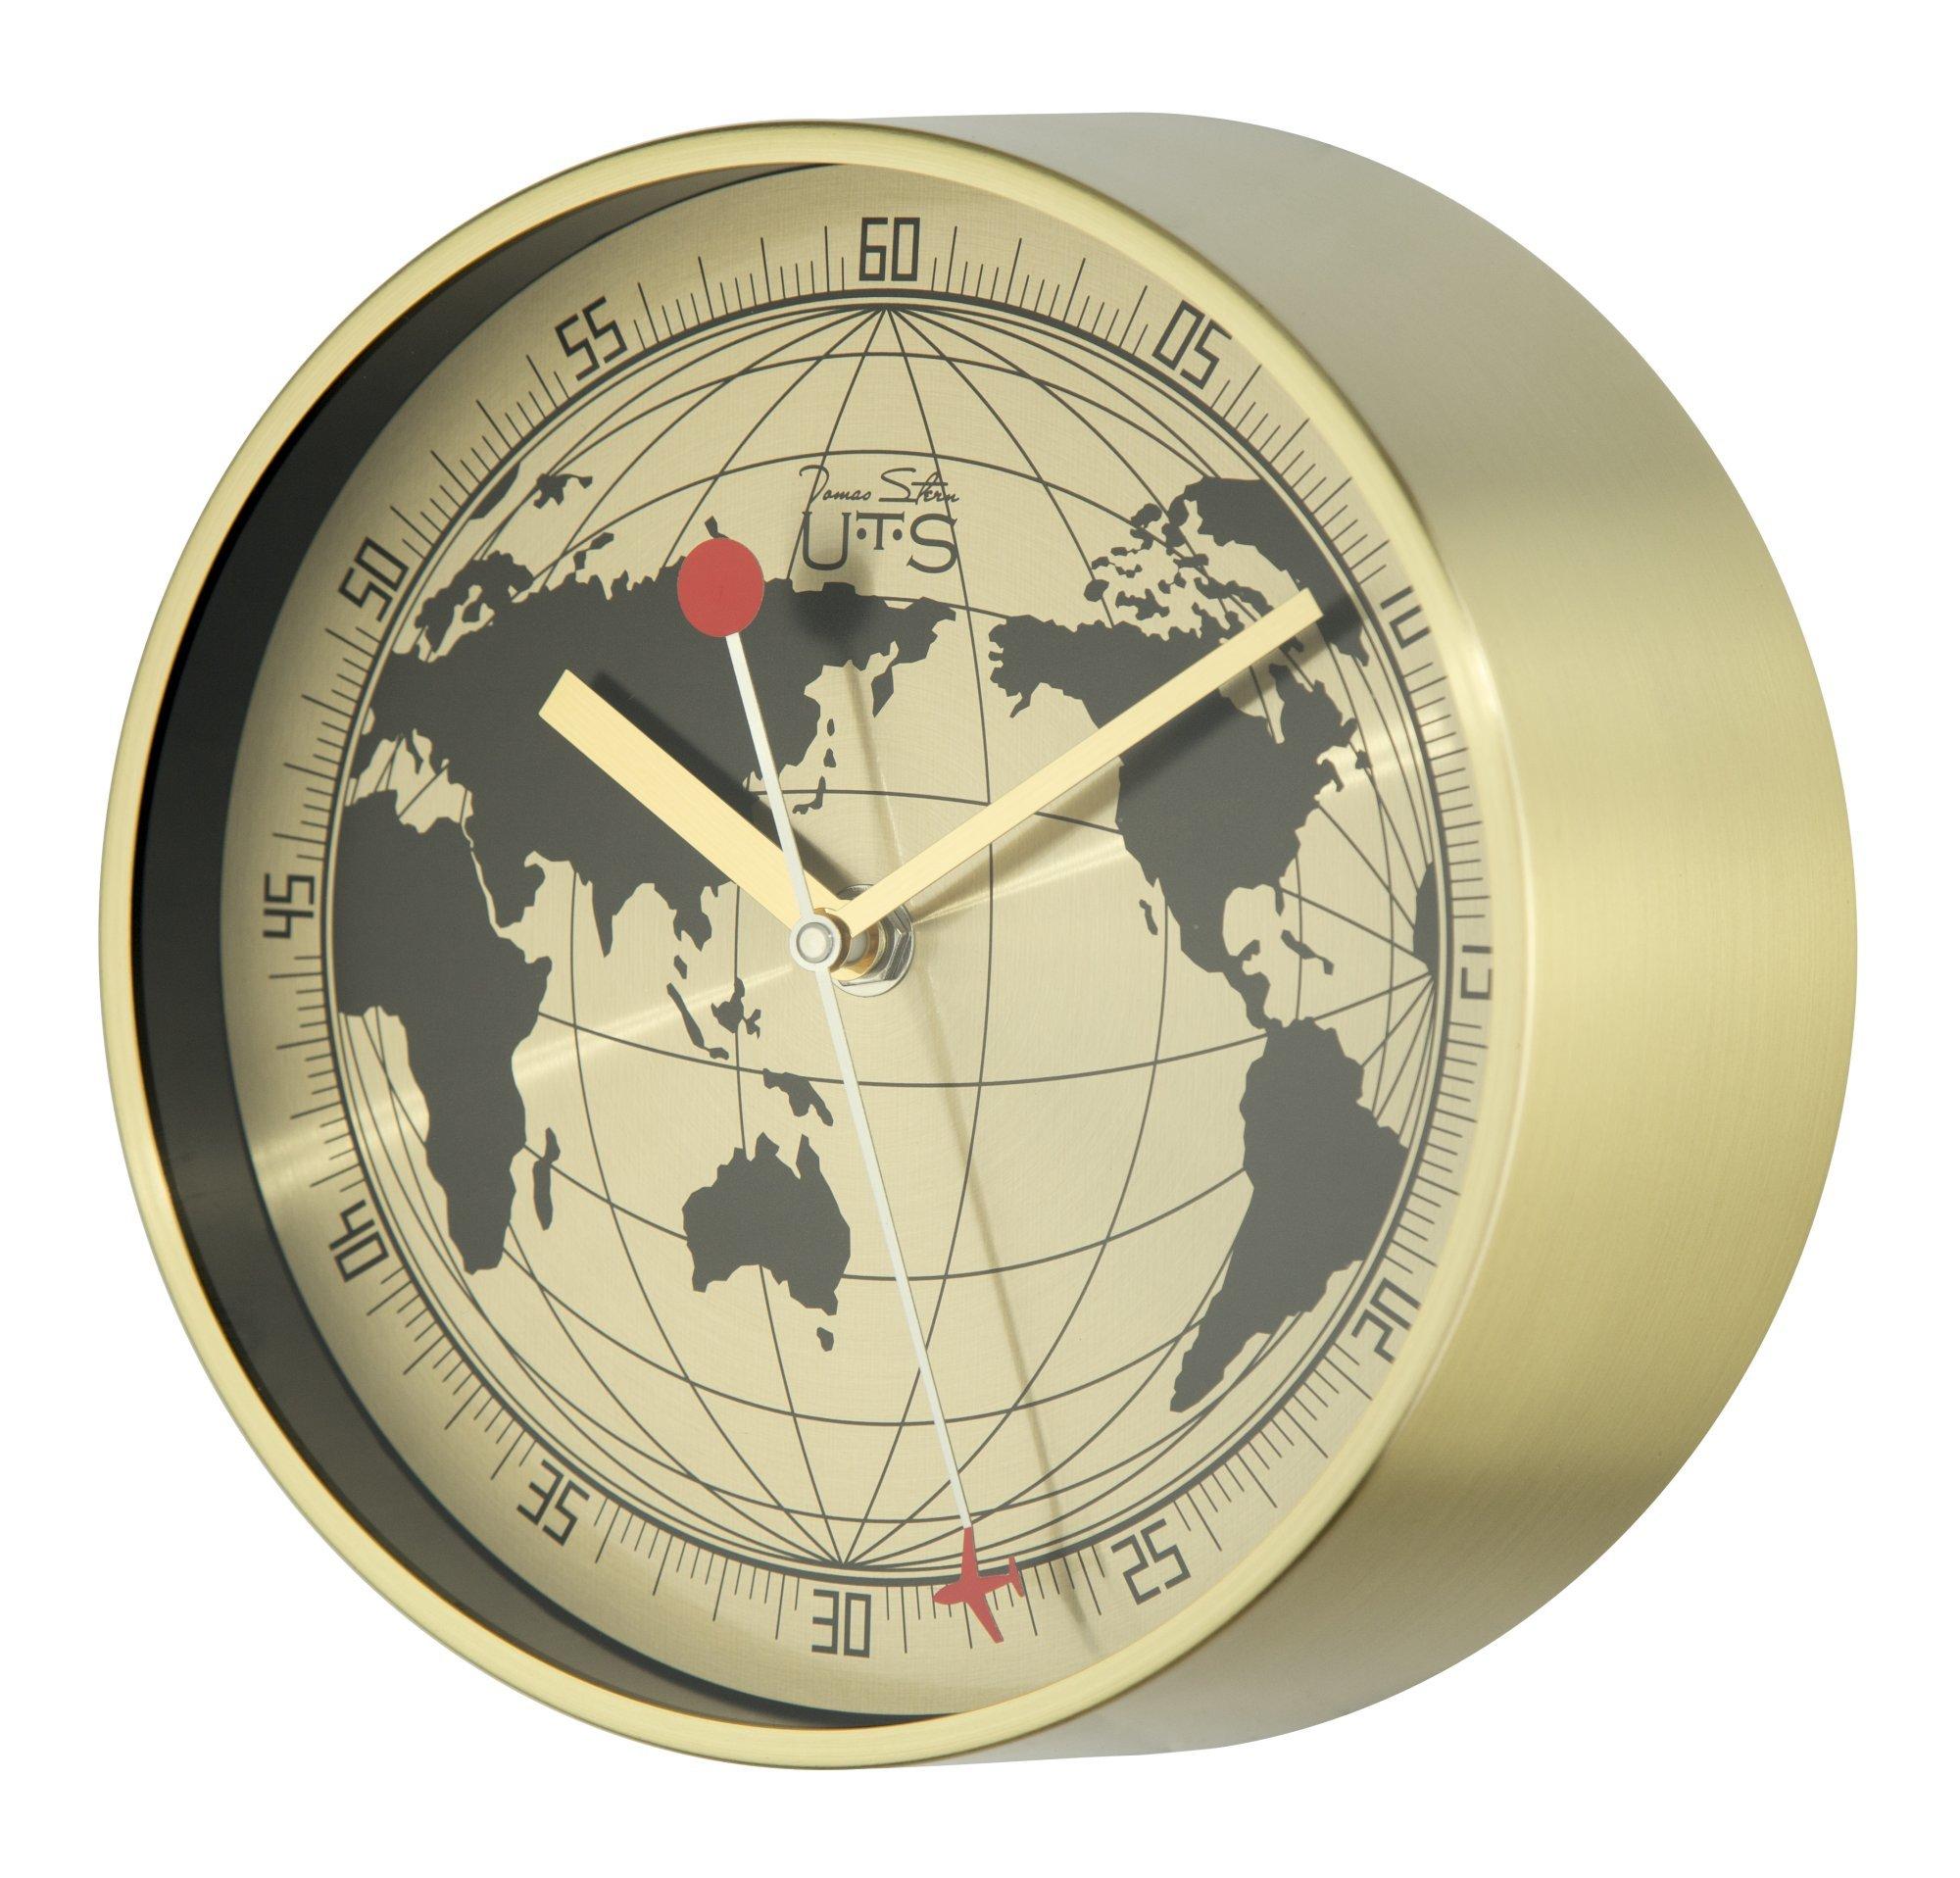 Часы настенные Часы настенные Tomas Stern 4014G chasy-nastennye-tomas-stern-4014g-germaniya.jpg